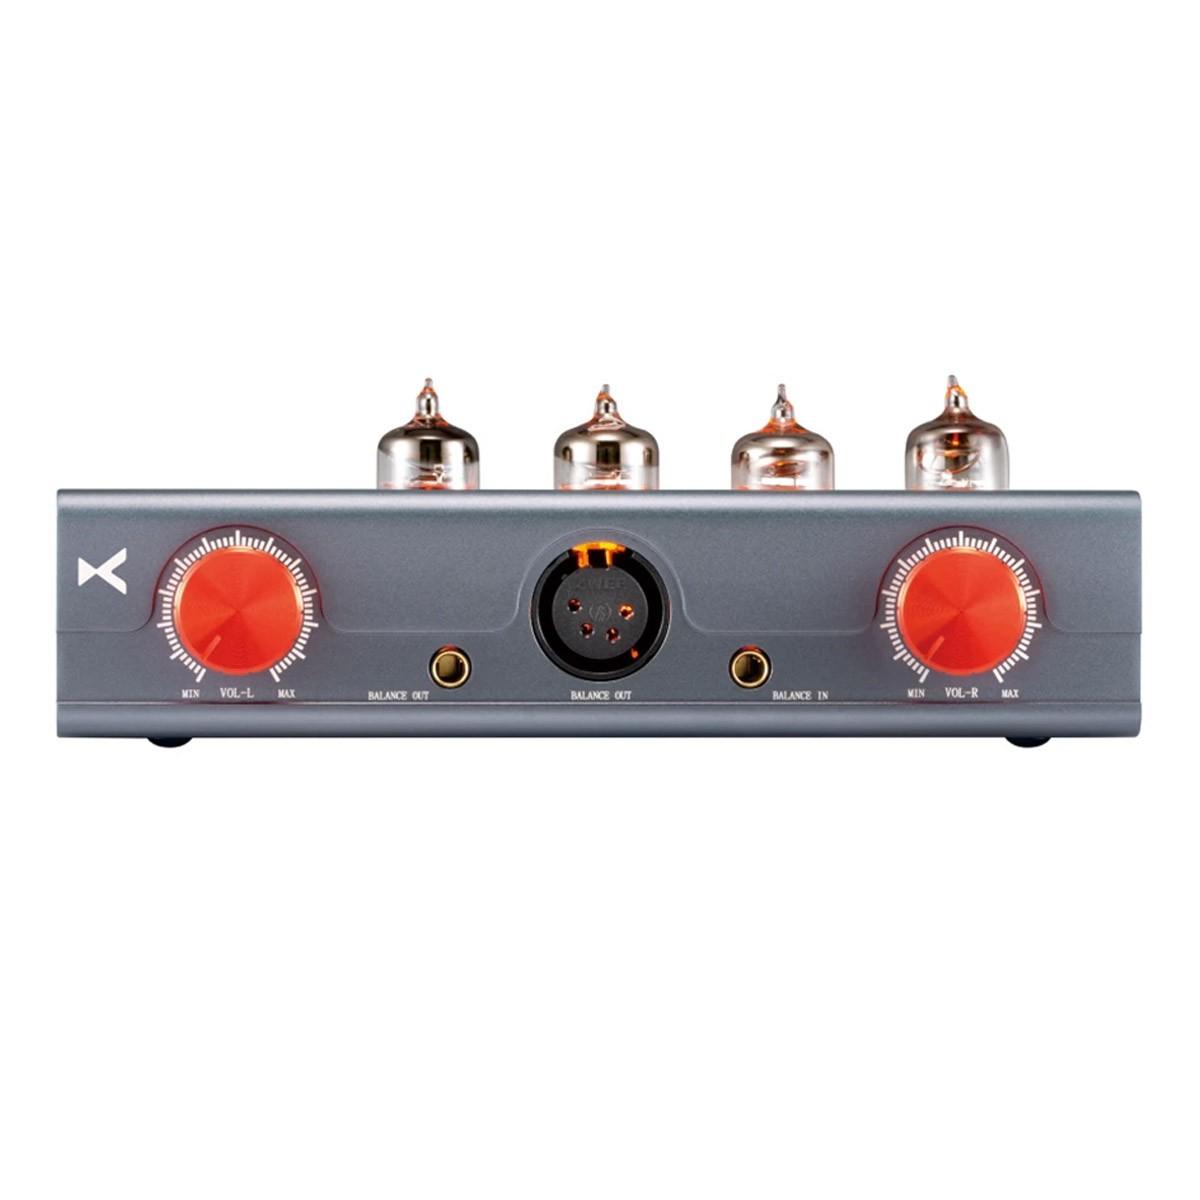 XDUOO MT-604 Headphone Amplifier 4x 6J1 Tubes Transistors Class A Balanced